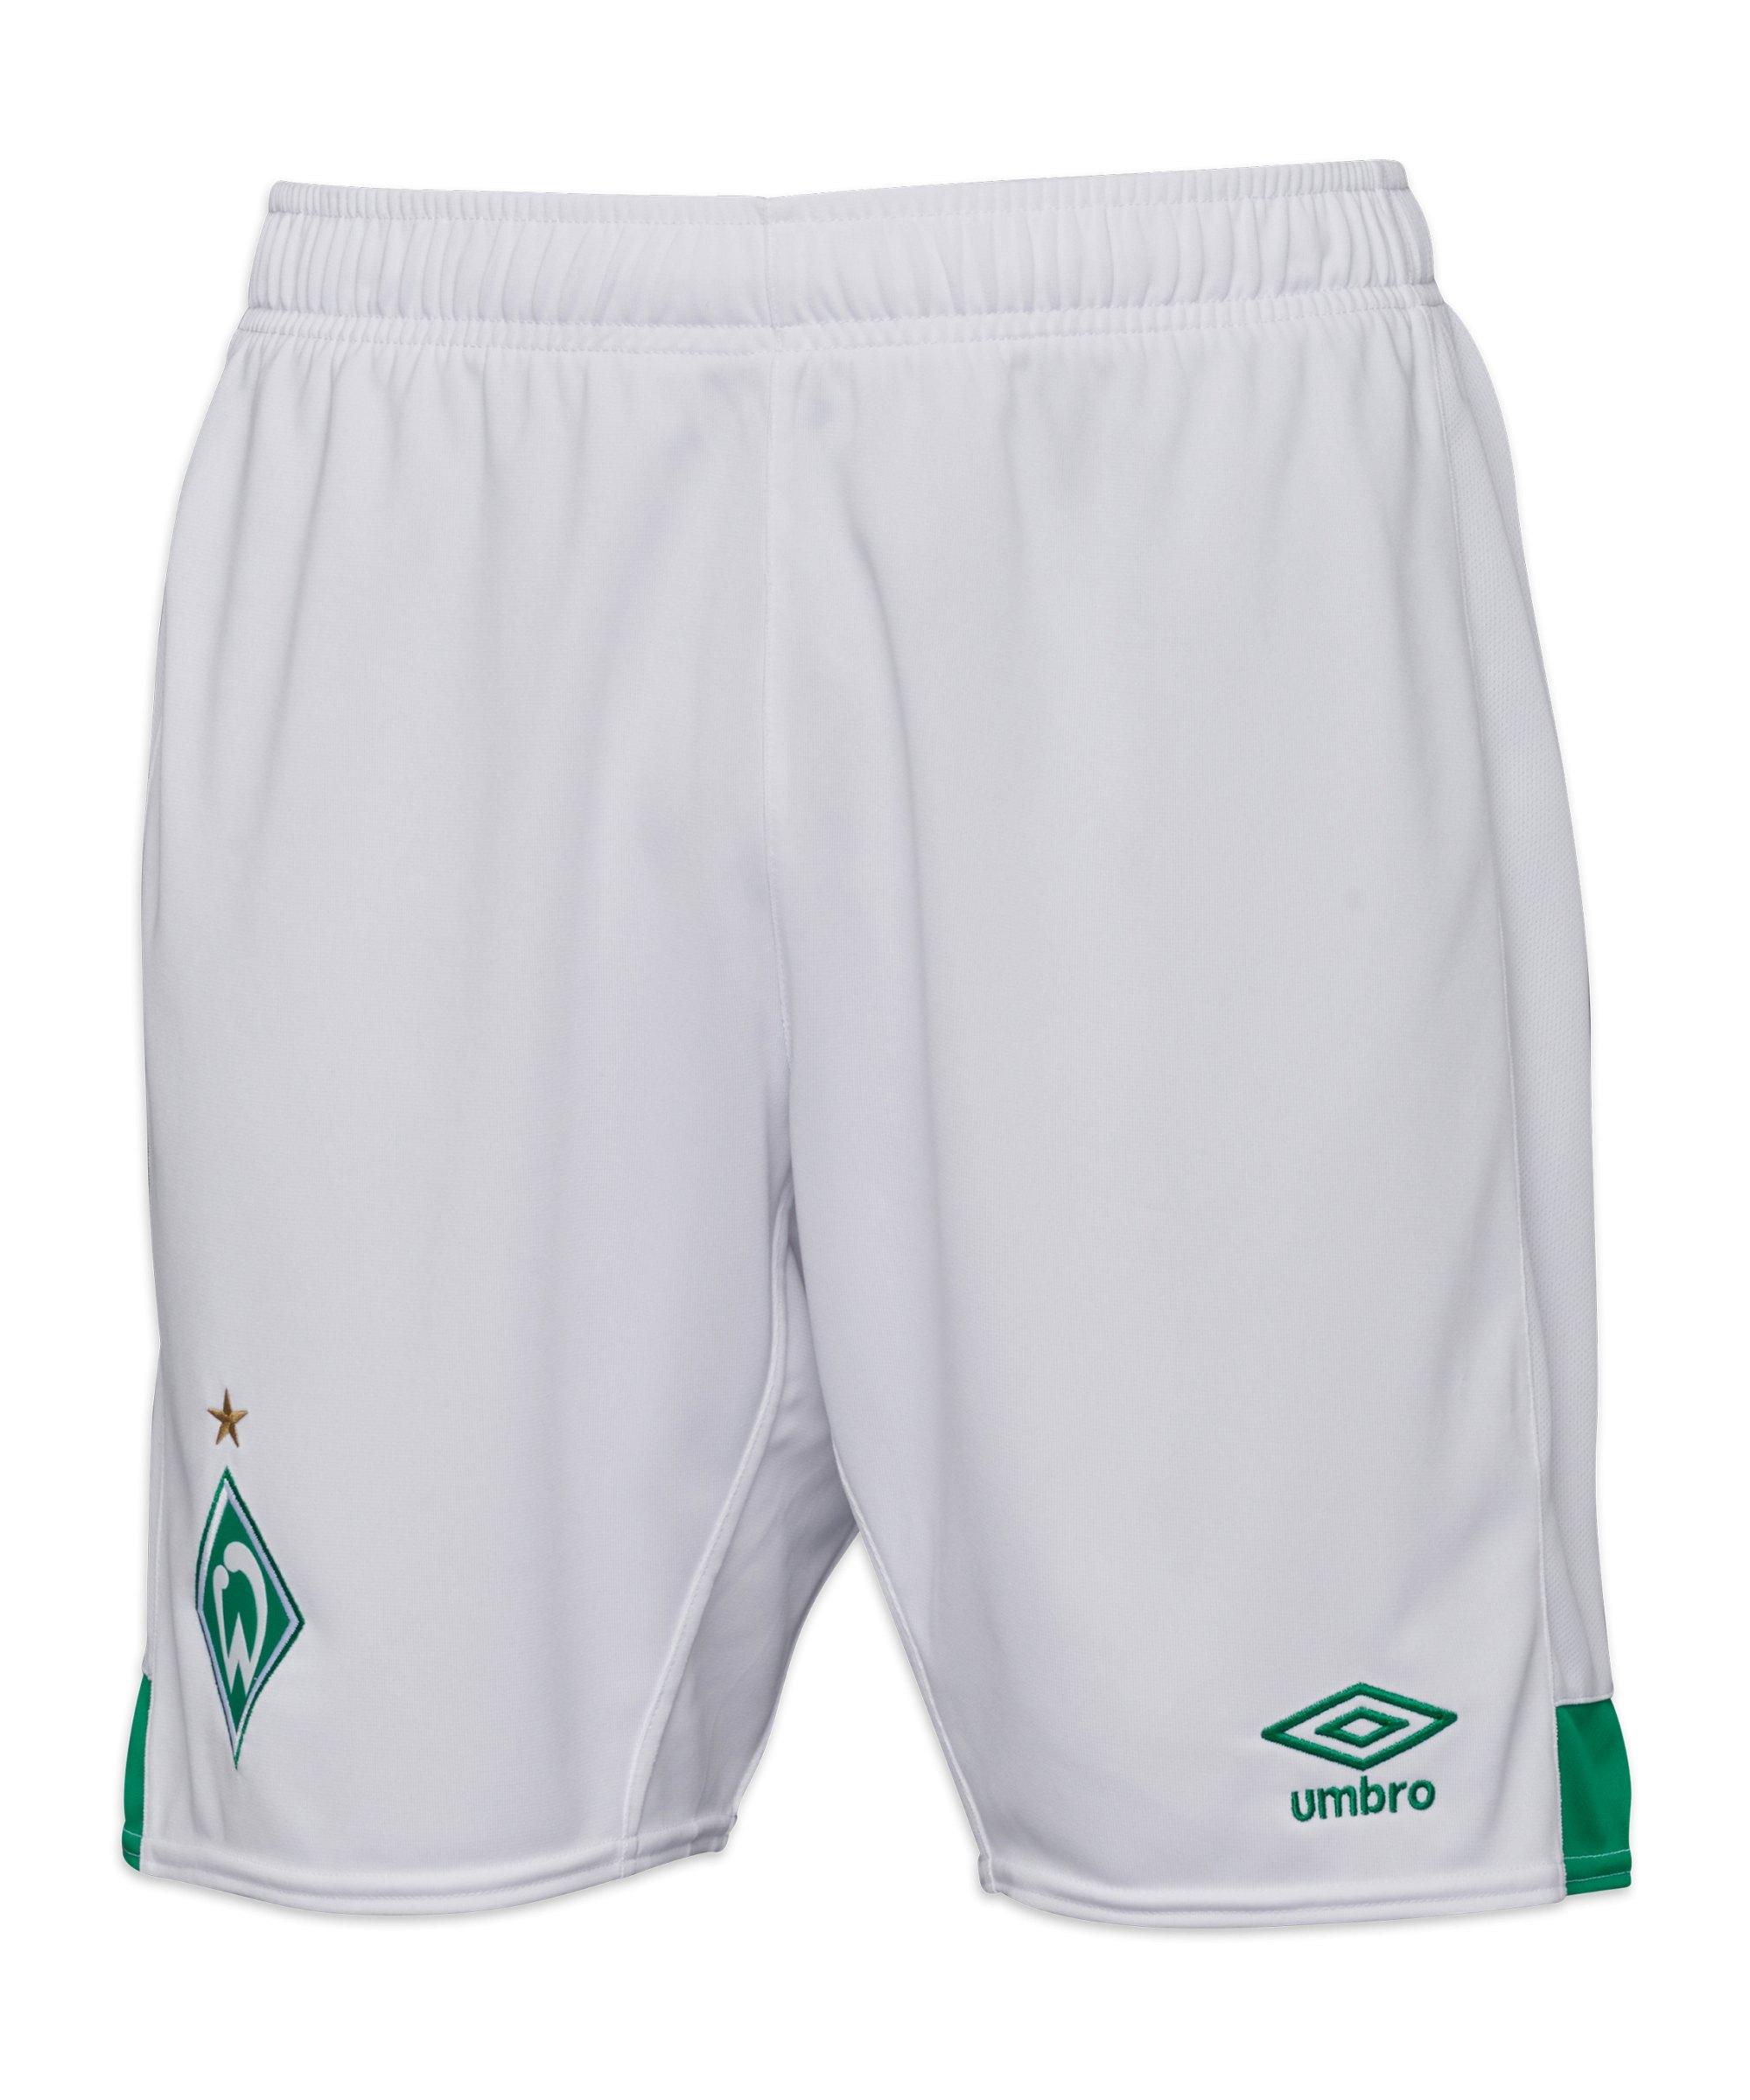 Umbro SV Werder Bremen Short Home 2021/2022 Weiss - weiss